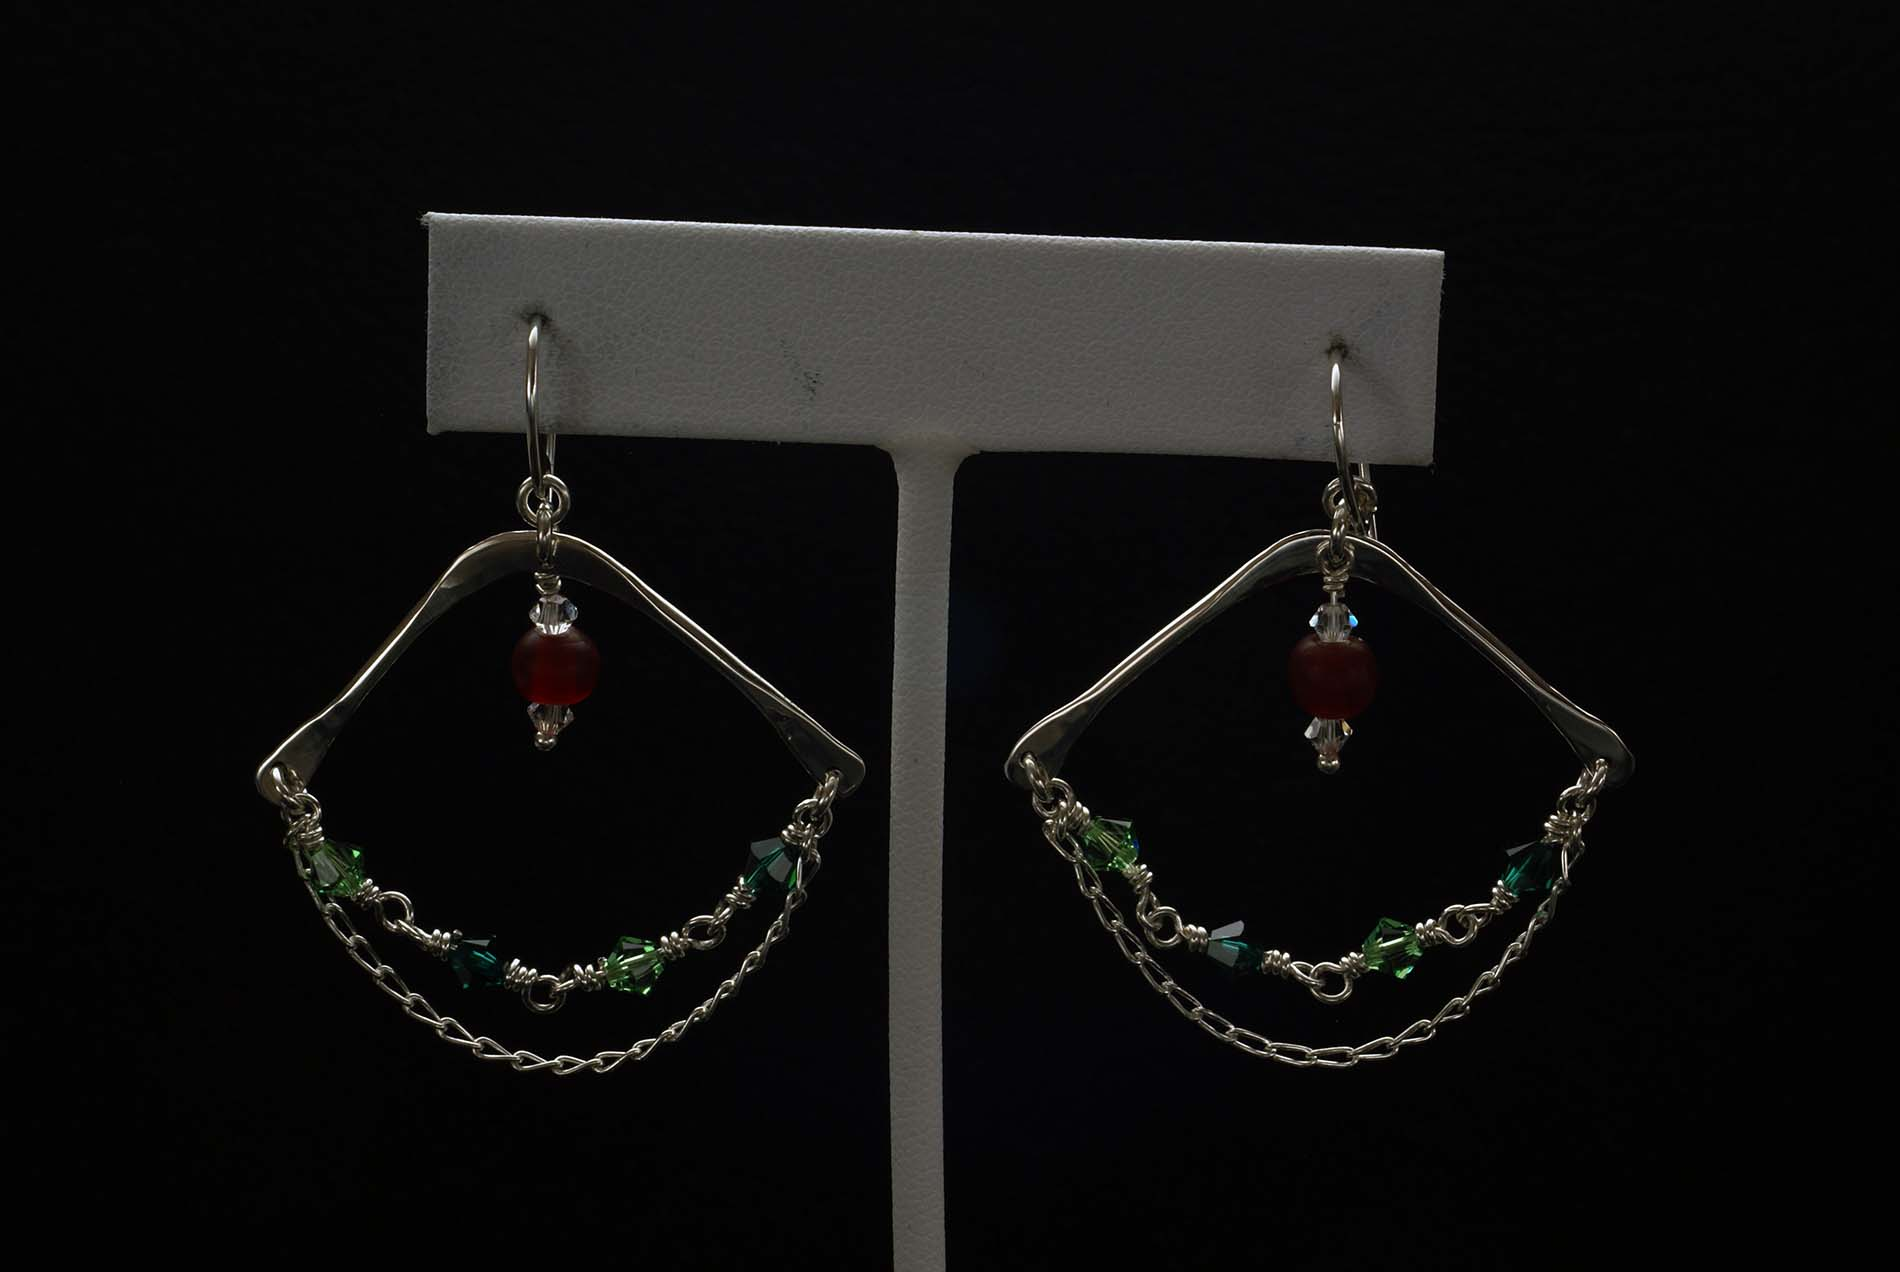 Hanging Chain Beads Earrings